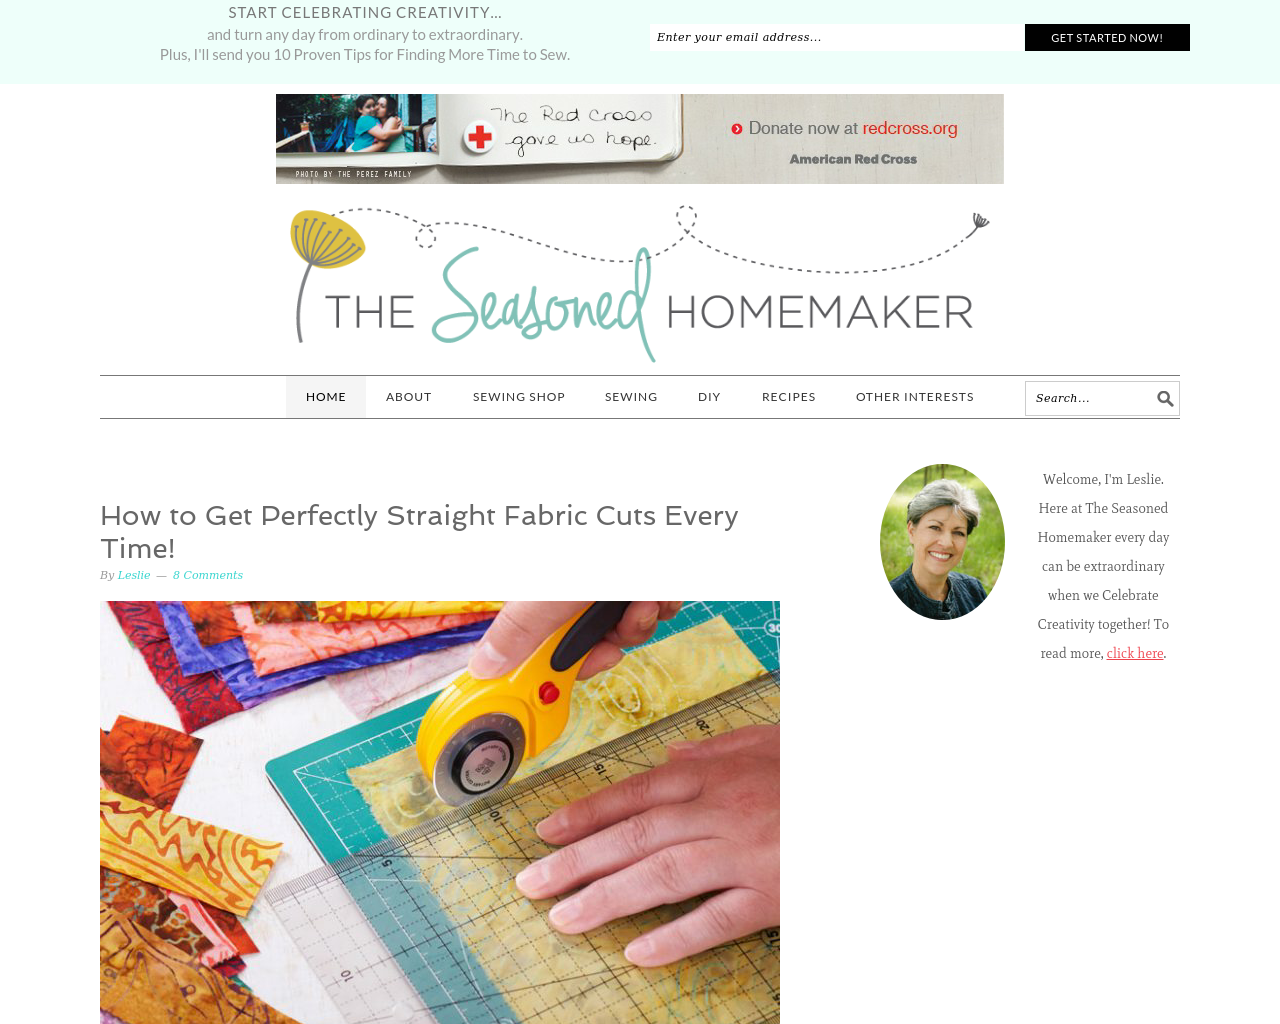 The-Seasoned-Homemaker-Advertising-Reviews-Pricing